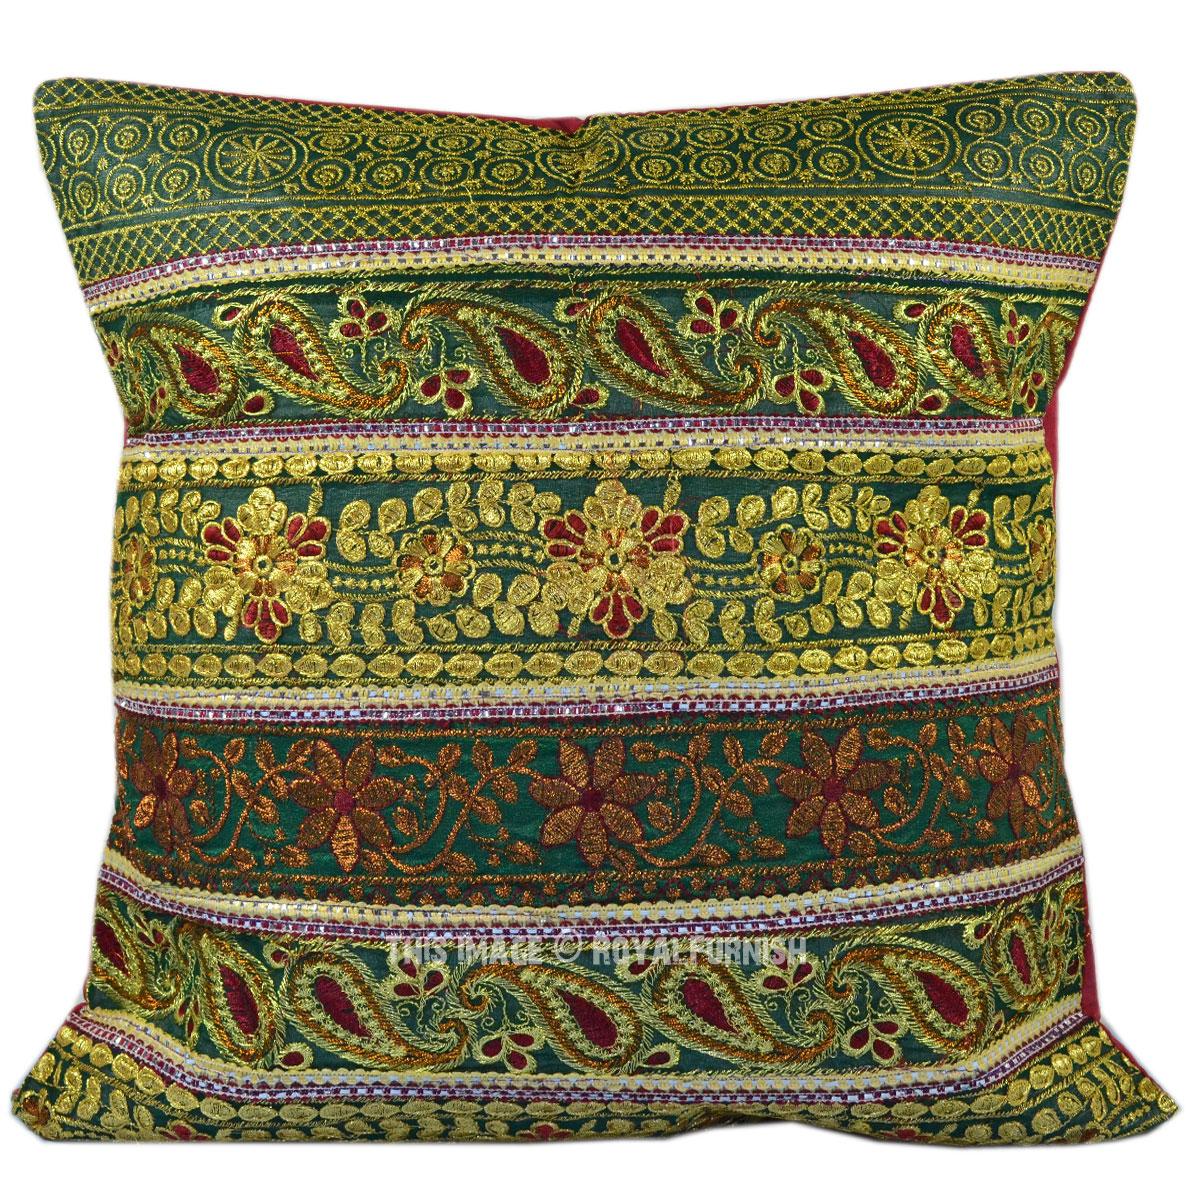 Antique Golden Thread Sequin Embroidered Indian Decorative Silk Throw Pillow - RoyalFurnish.com